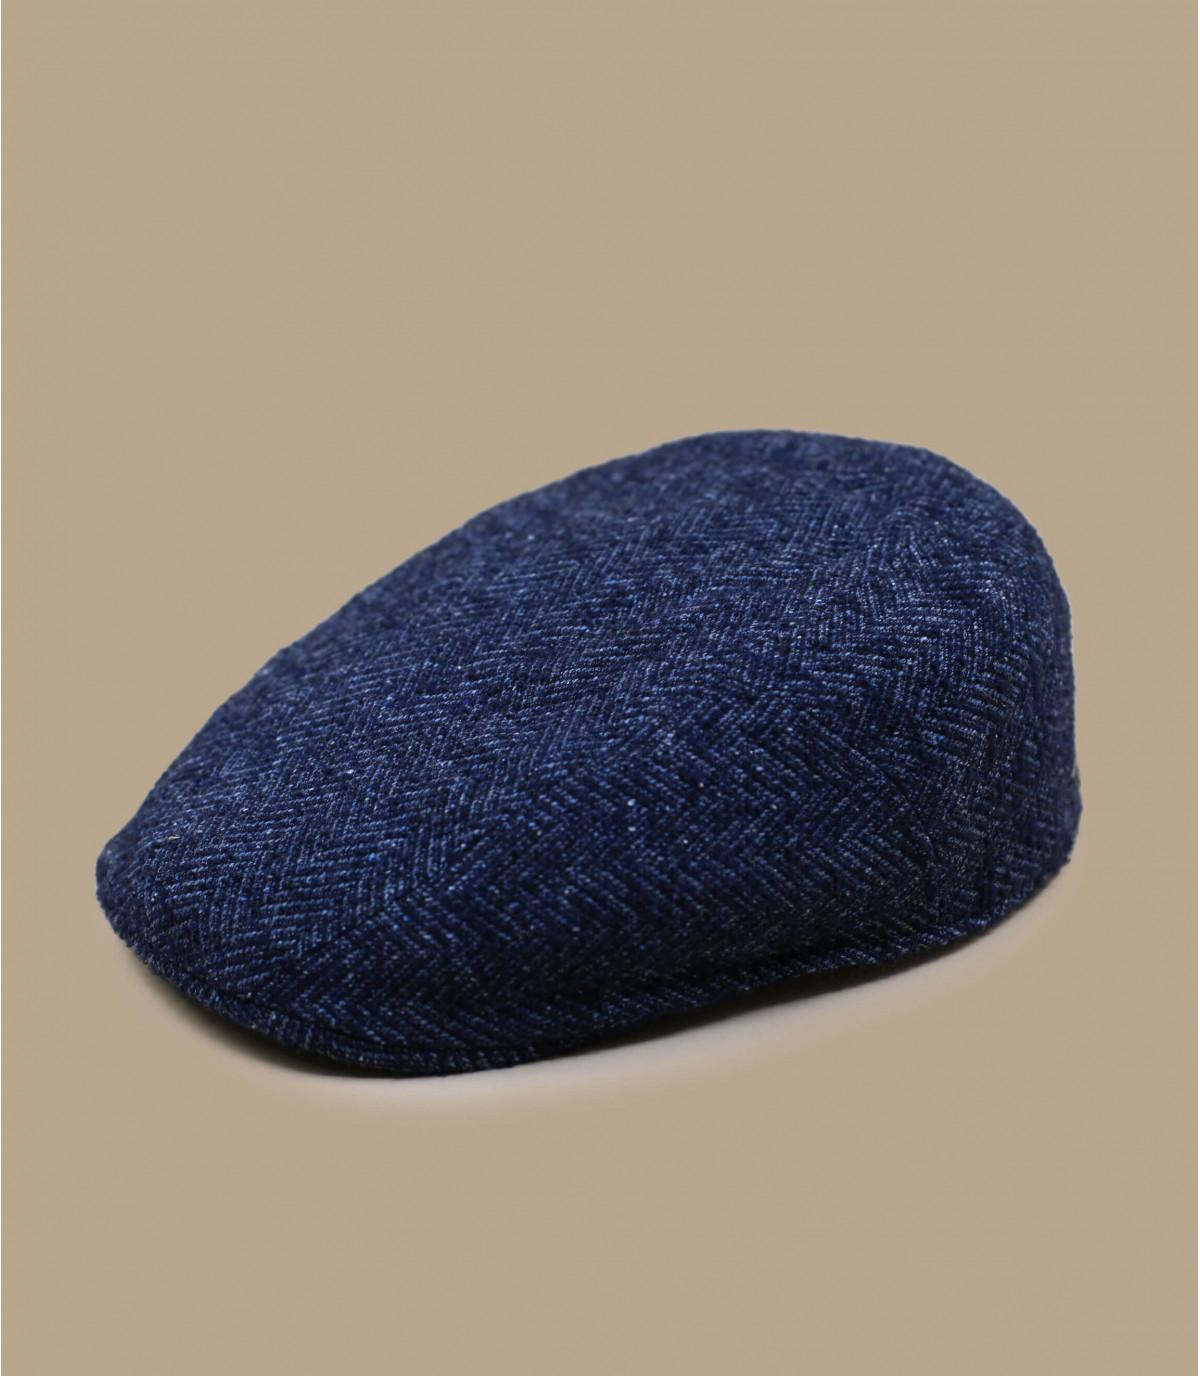 baret blauwe wol visgraat